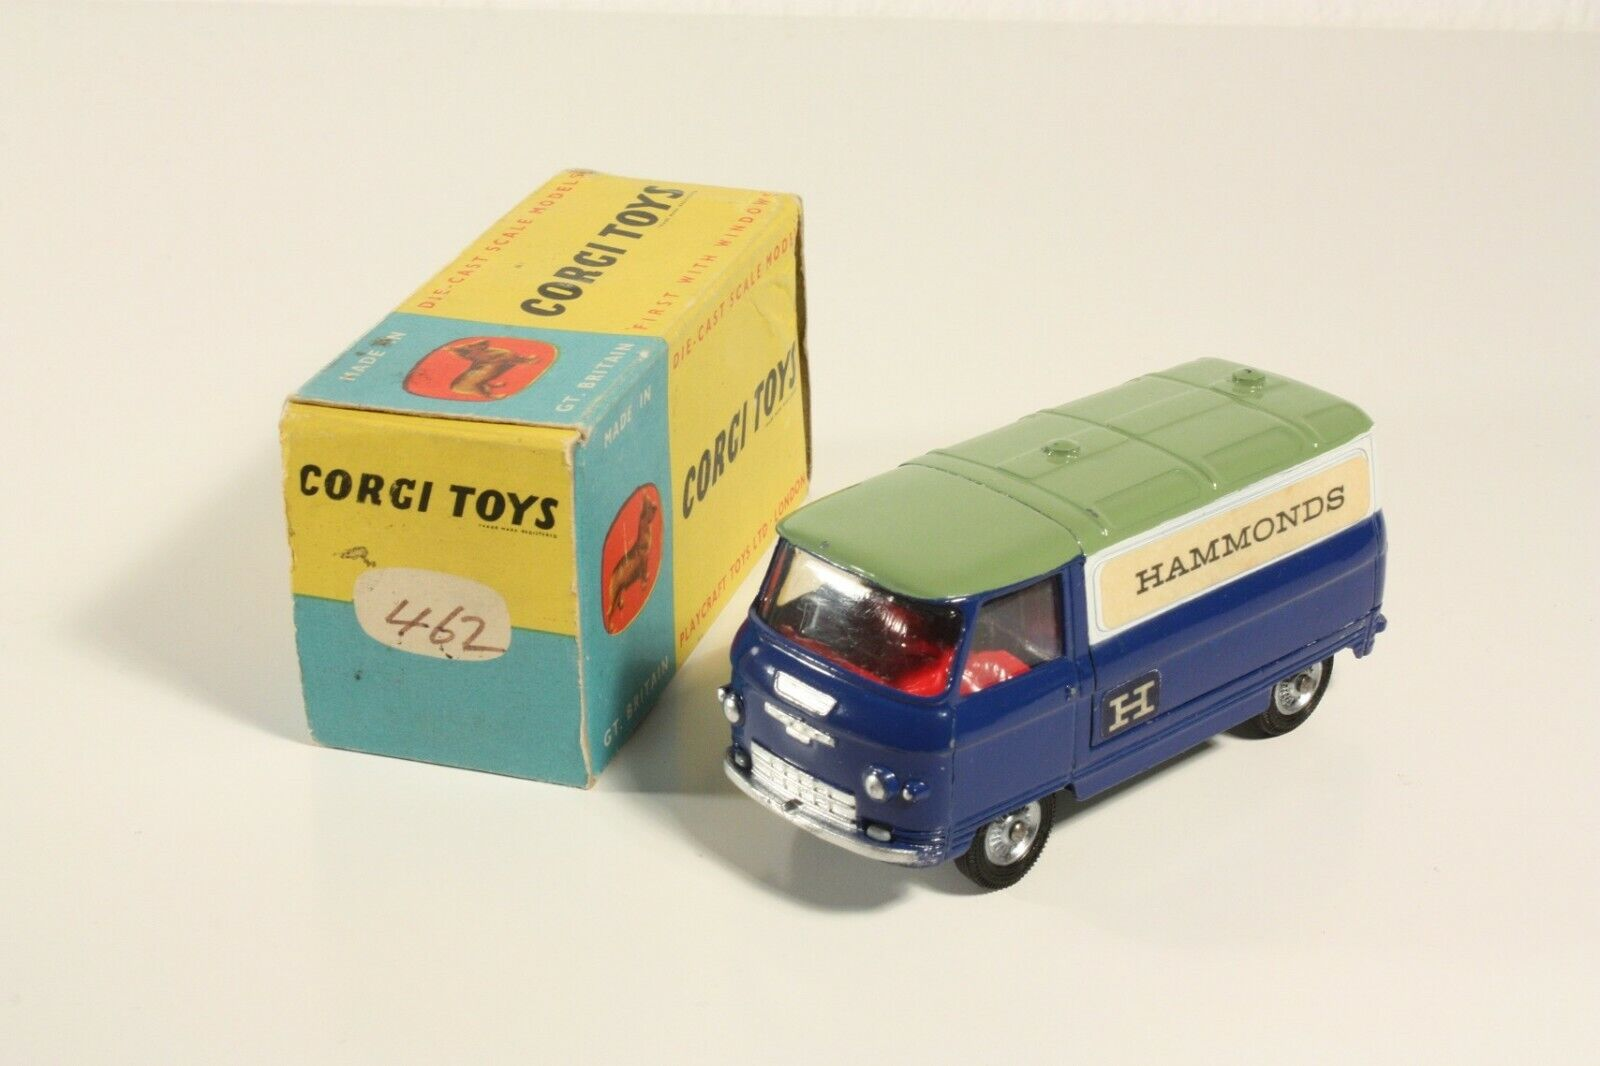 CORGI TOYS 462, commer Van Hammonds  , promotionel, Mint in Box  ab2298